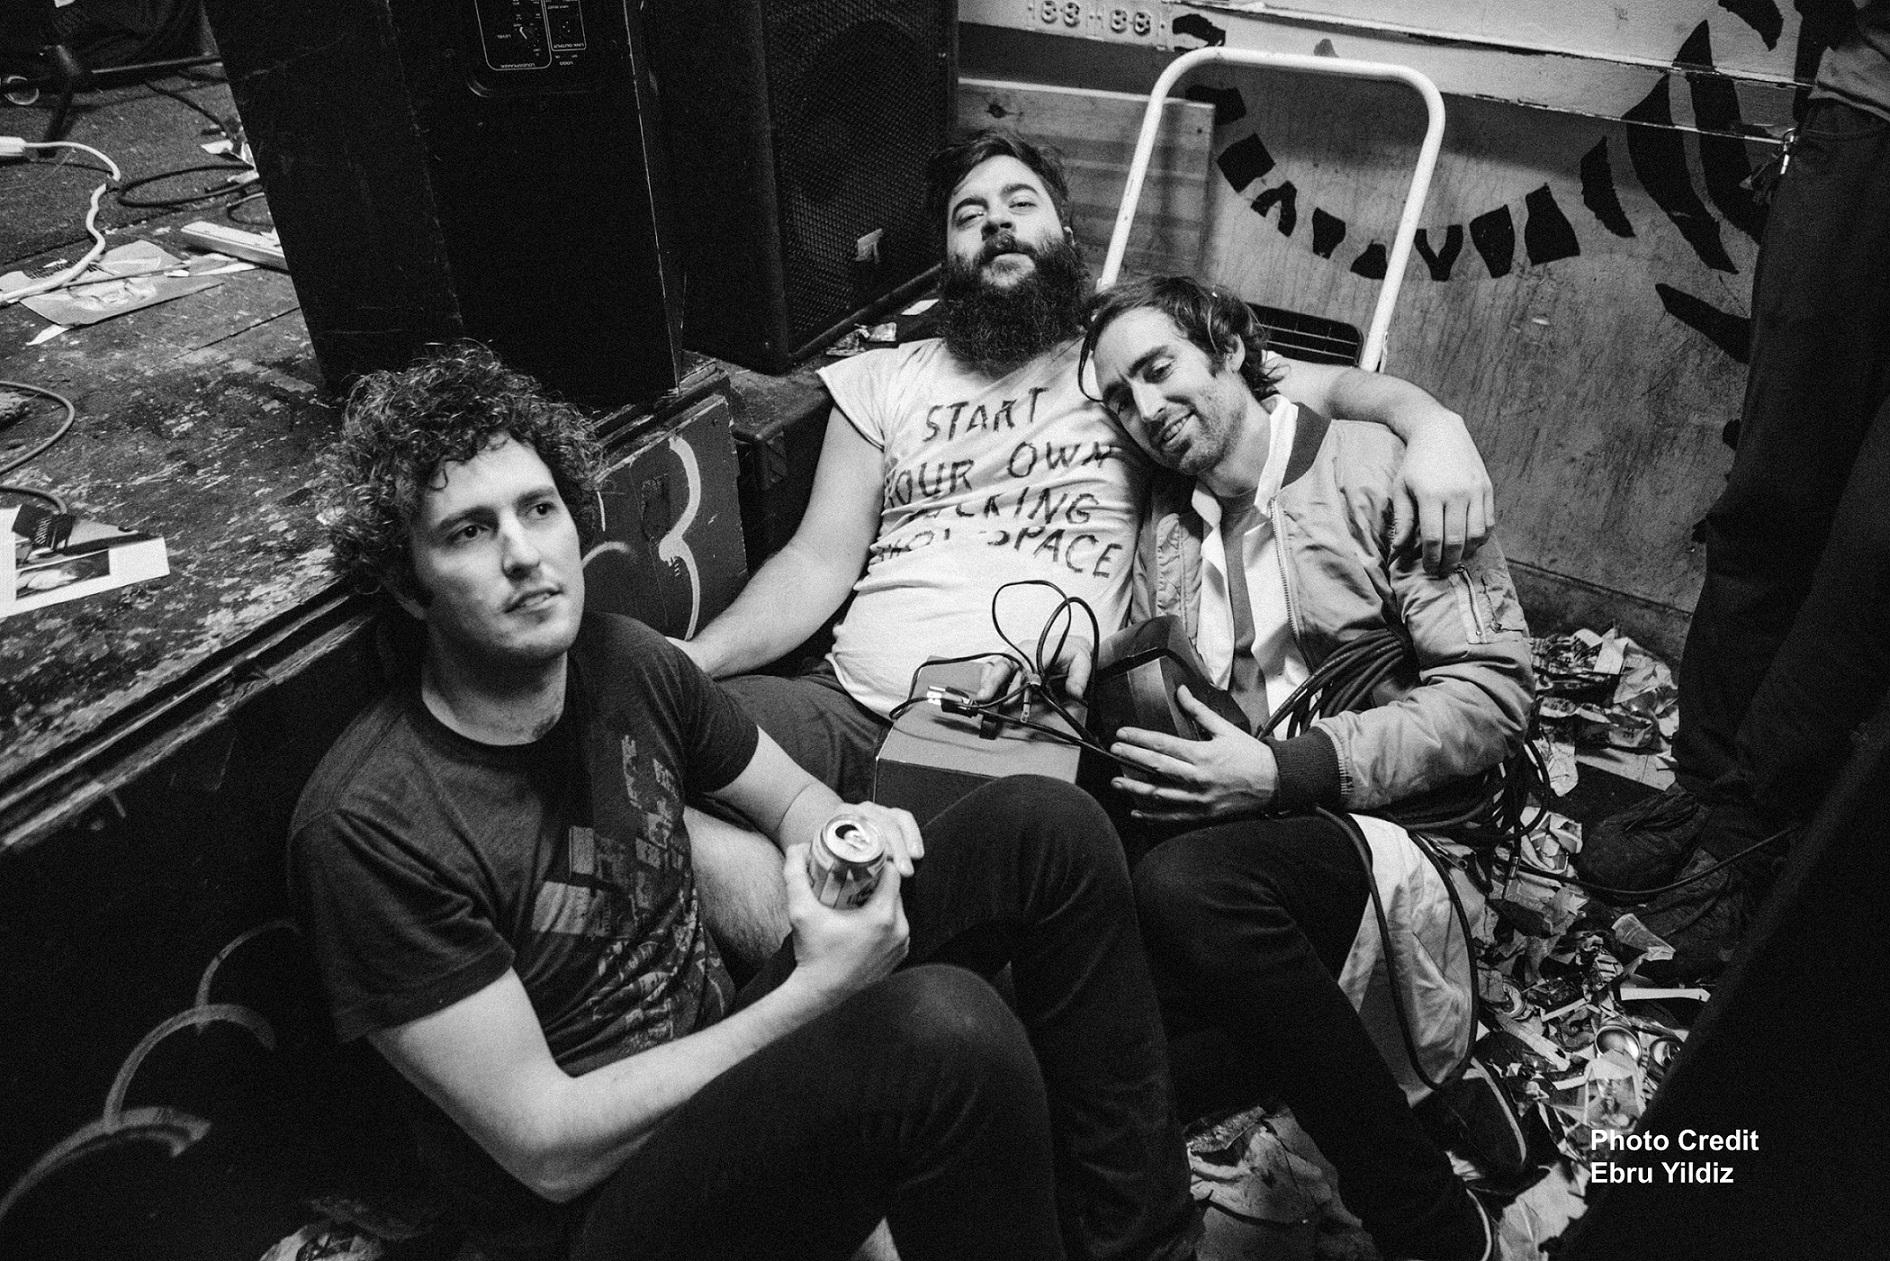 Death By Audio 的核心經營團隊(由左至右):Matt Conboy;Edan Wilber;Oliver Ackermann